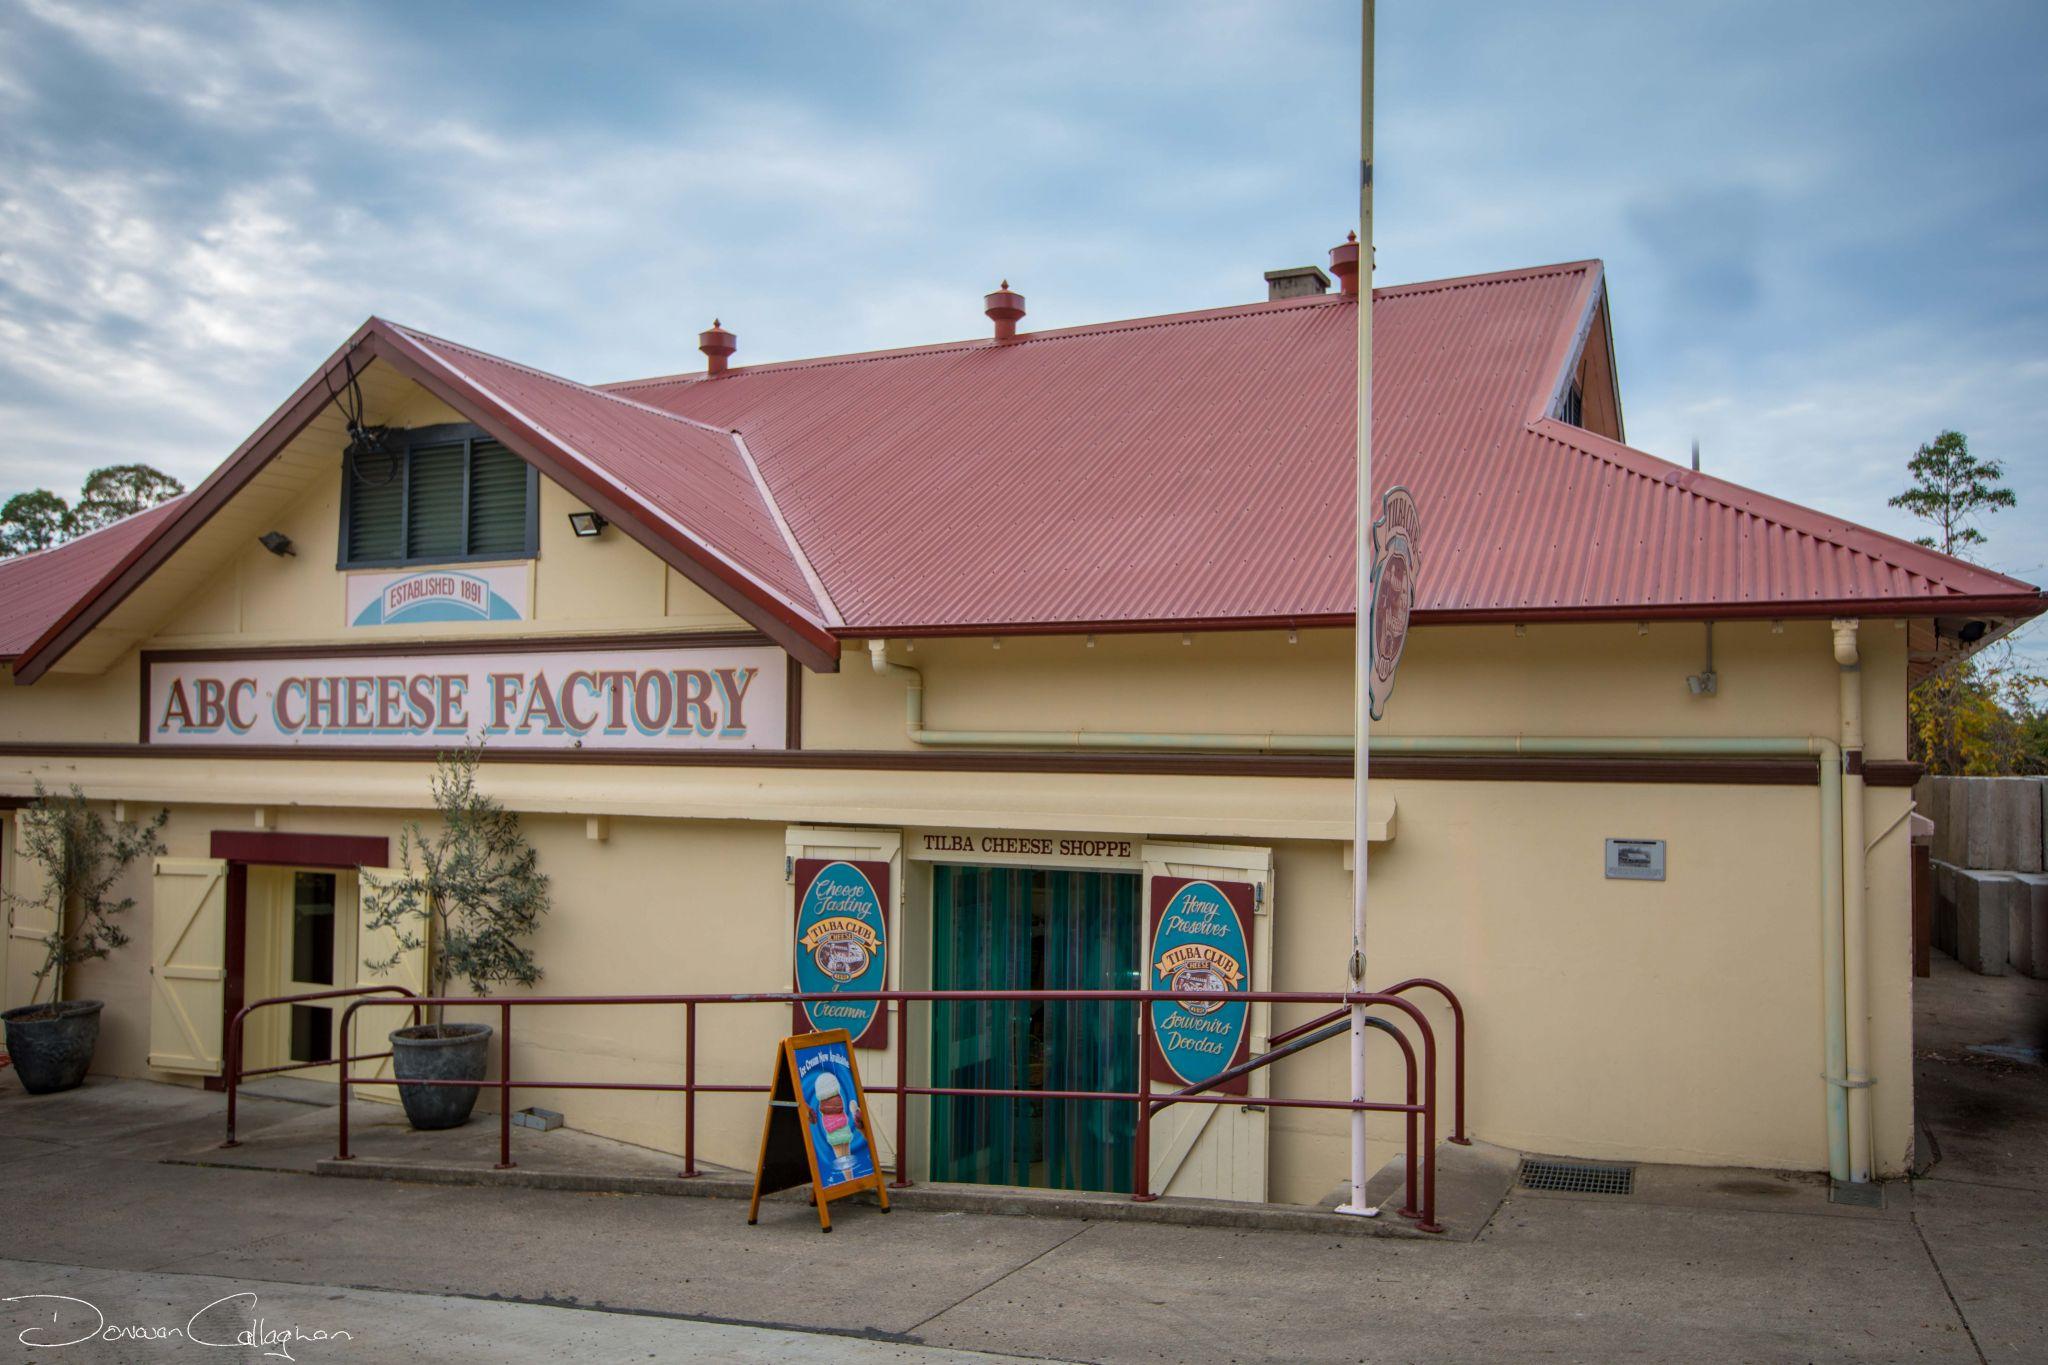 Historic ABC Cheese Factory Central Tilba NSW, Australia